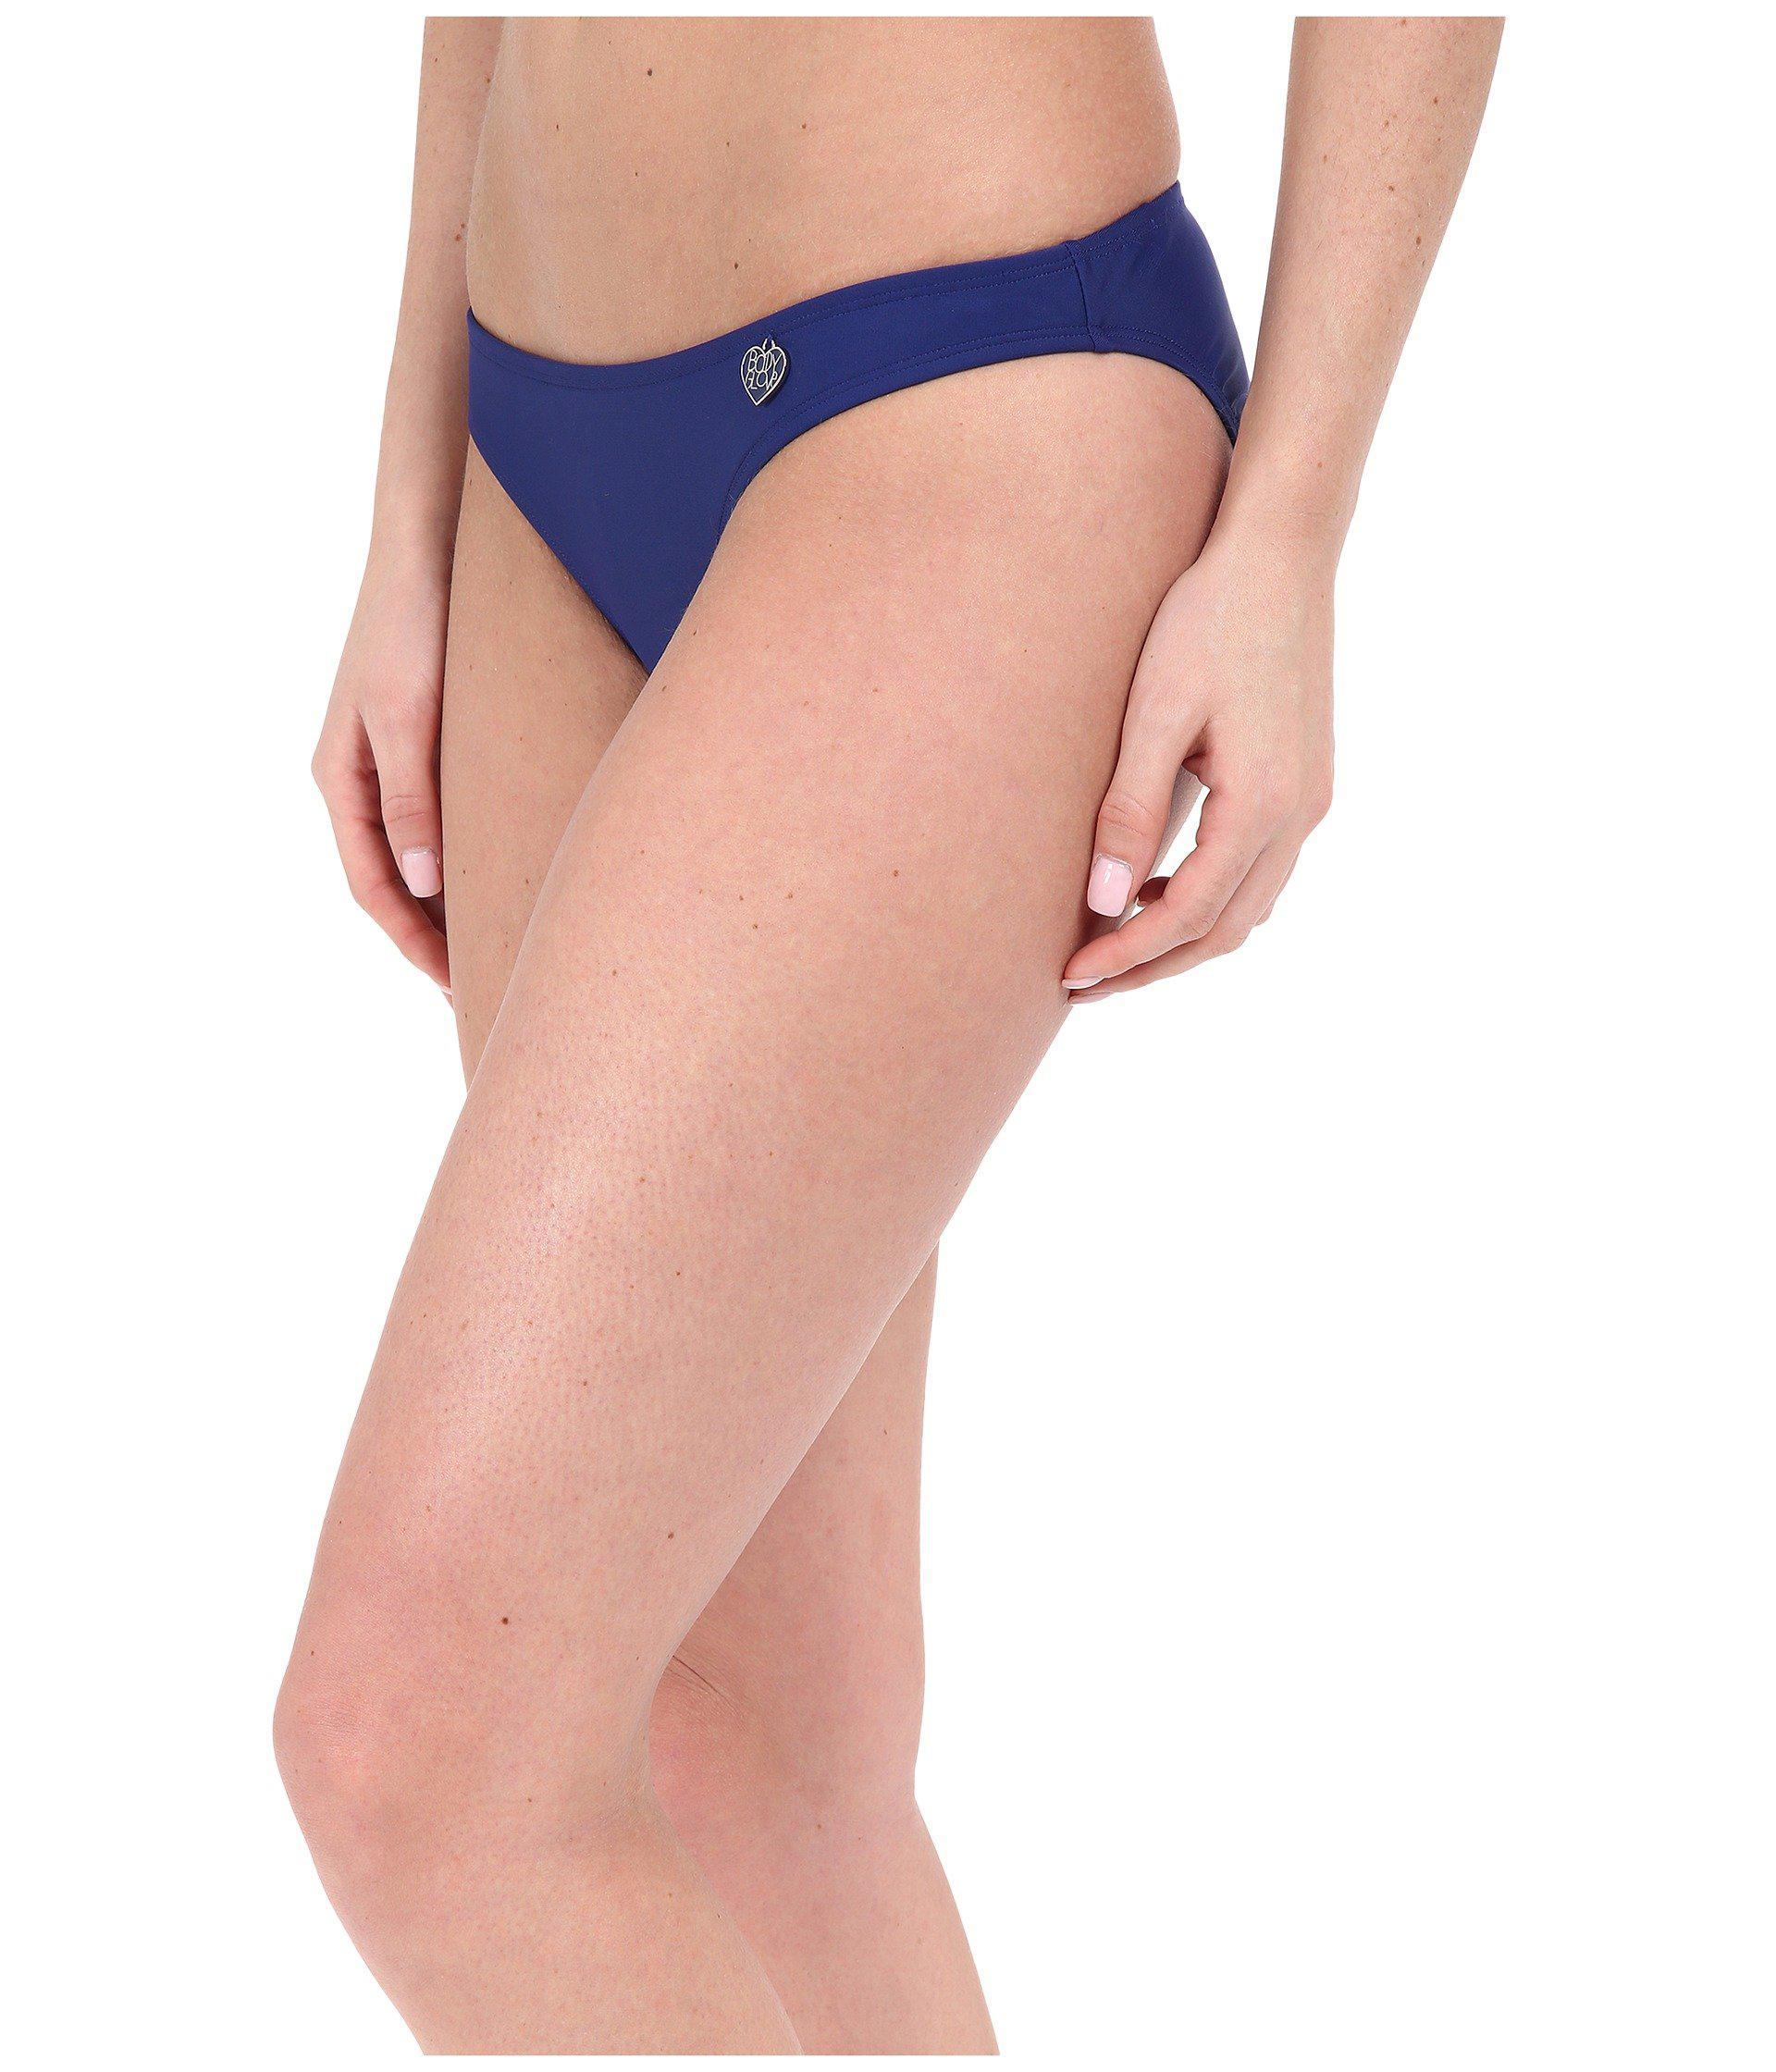 0984fb34ad8 Lyst - Body Glove Smoothies Basic Bikini Bottom (abyss) Women's ...